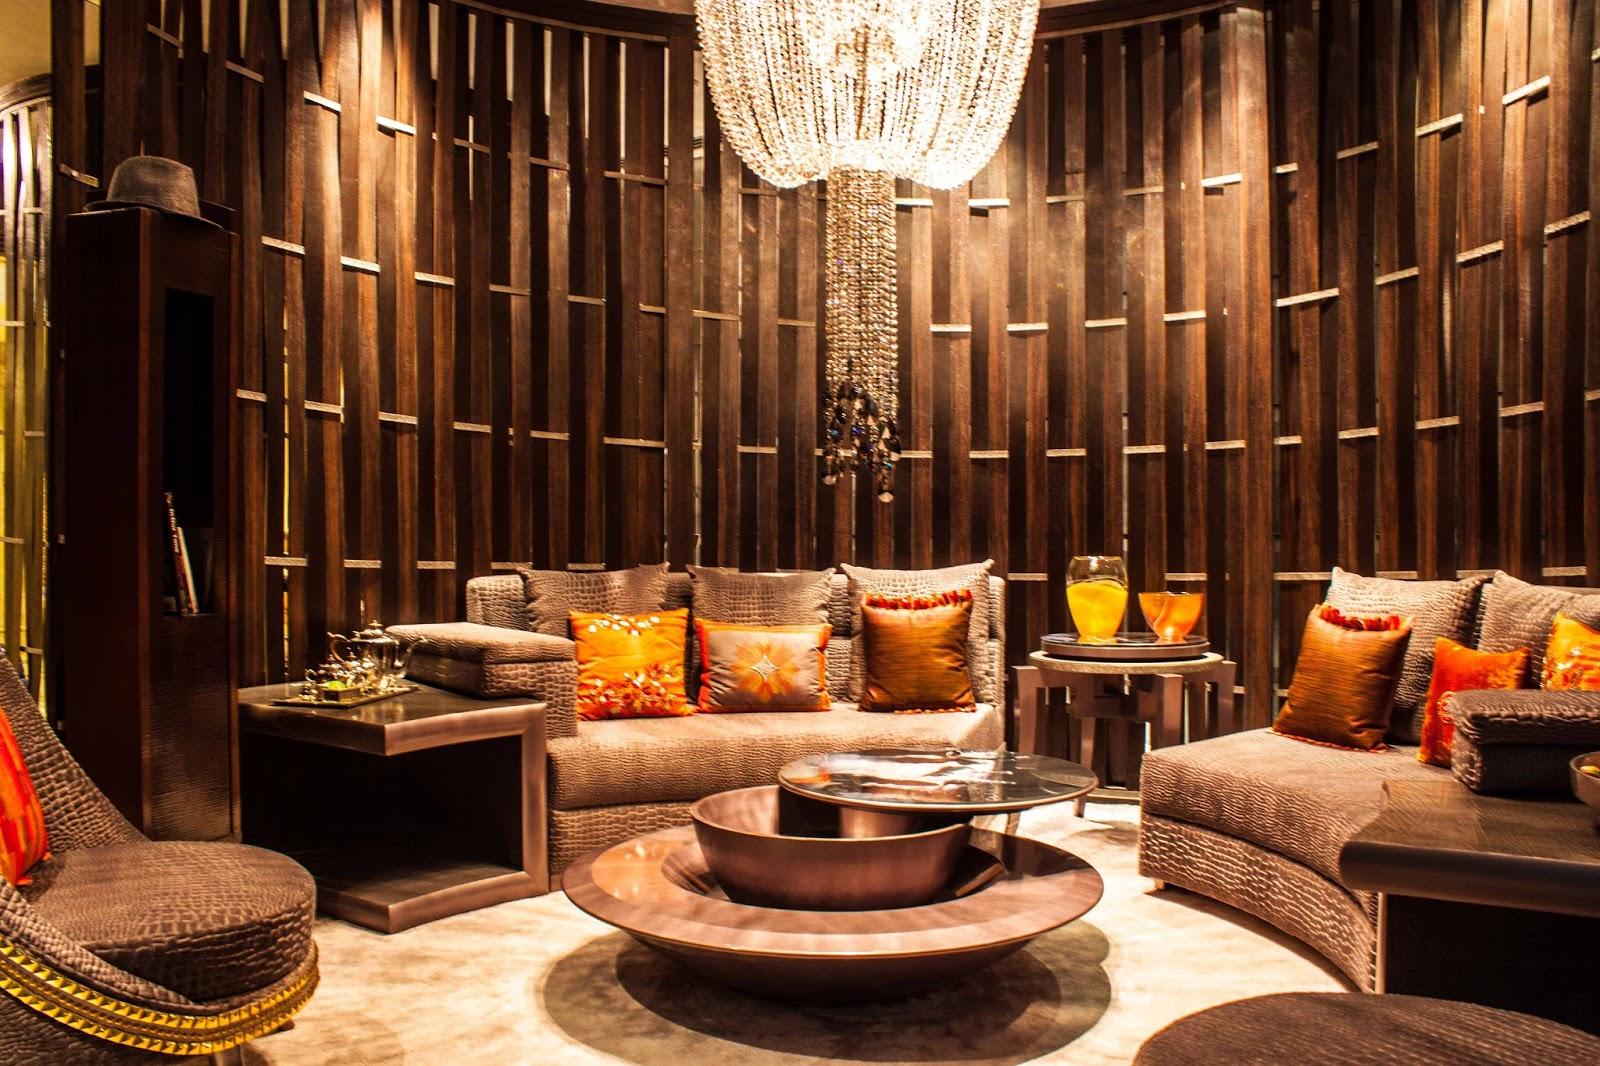 house with interior designing. Black Bedroom Furniture Sets. Home Design Ideas